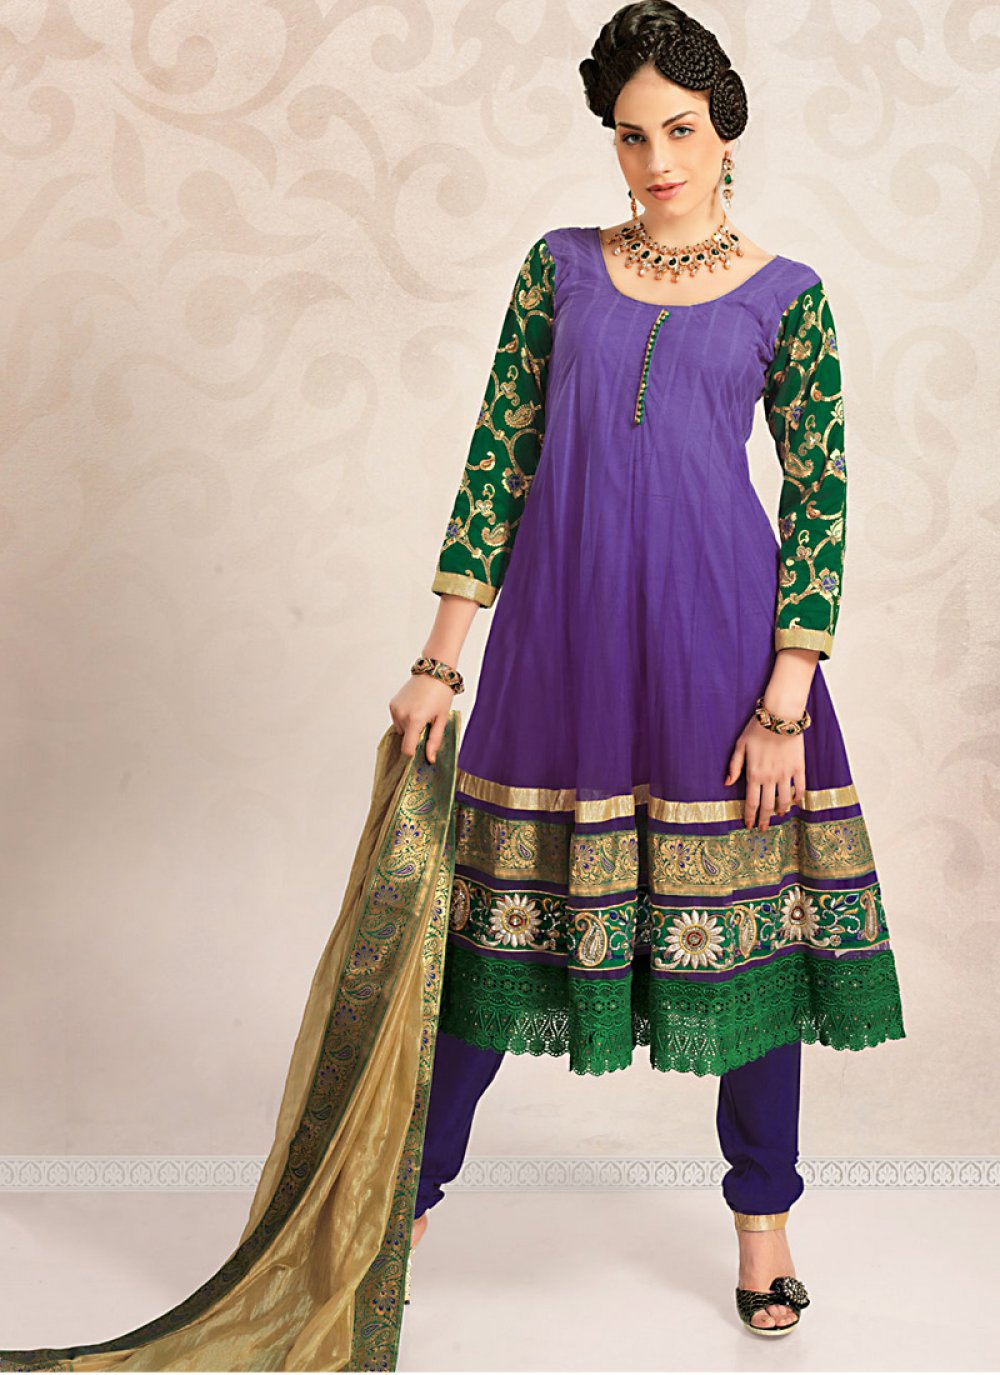 Bluish Purple & Bottle Green Salwar Kameez